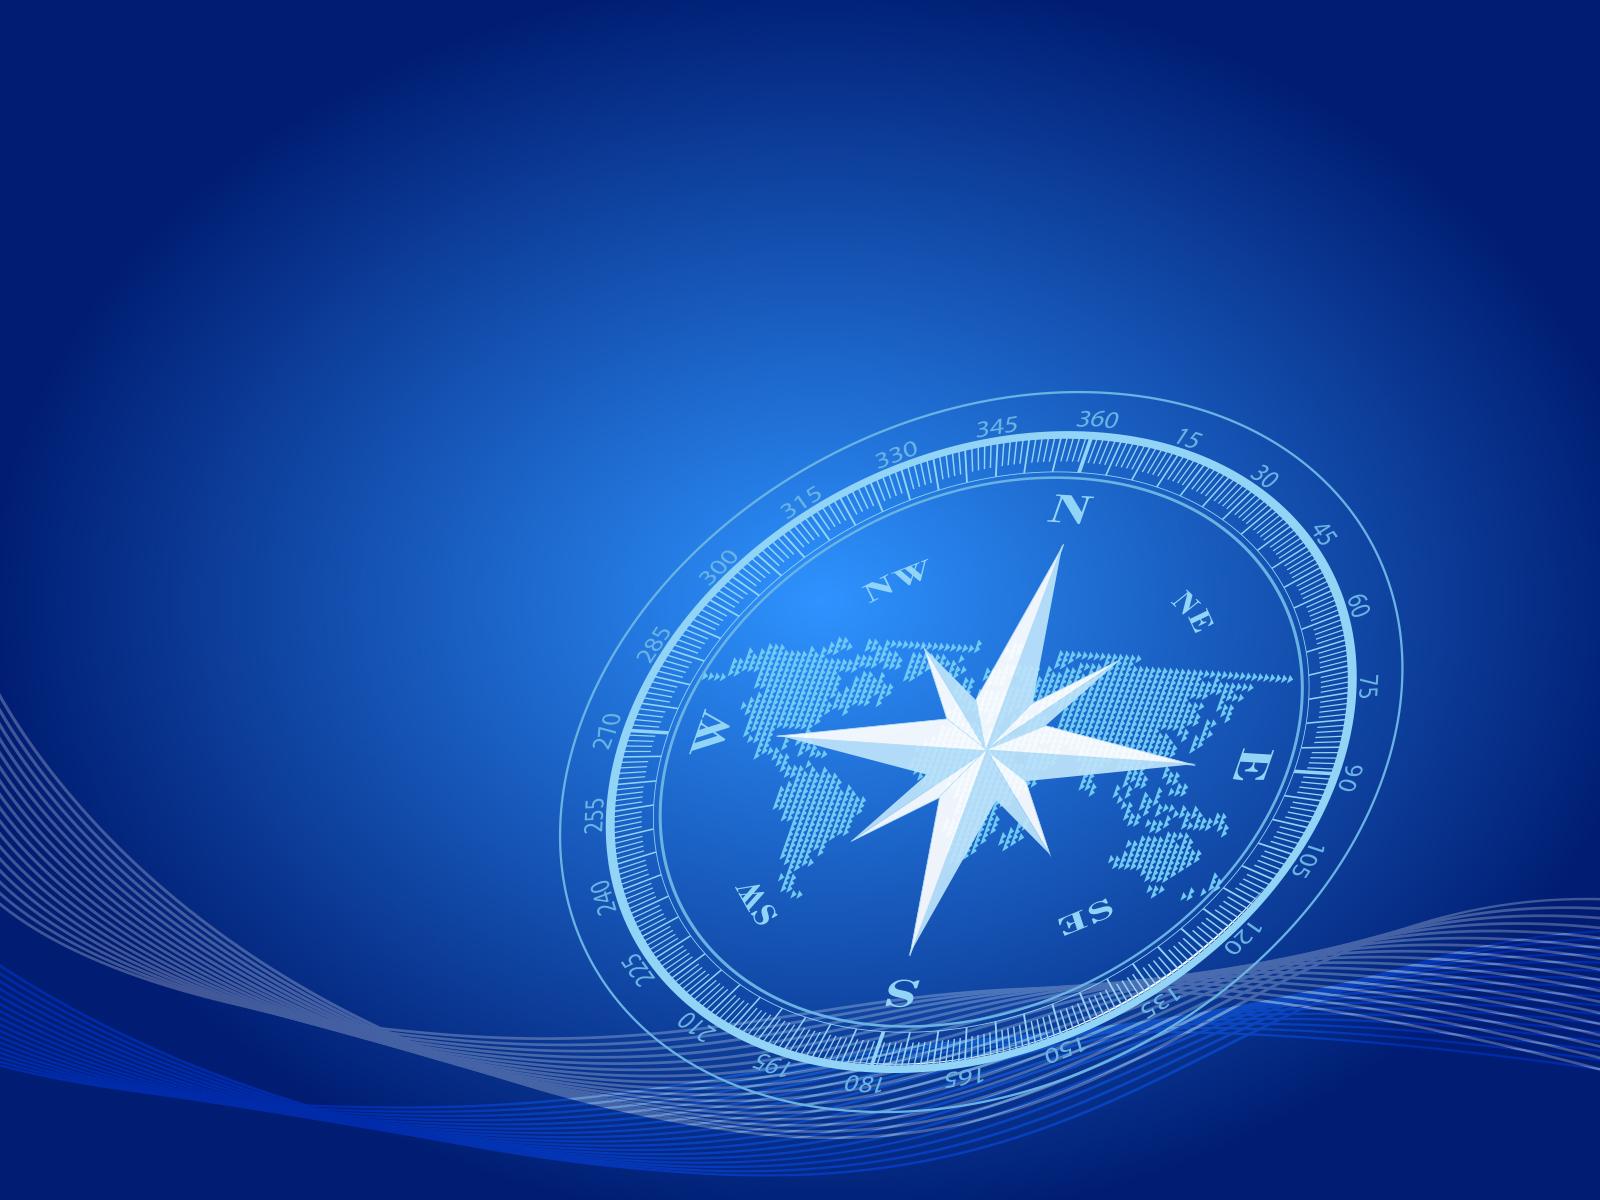 Compass Presentation Powerpoint Templates   3D Graphics Blue 1600x1200